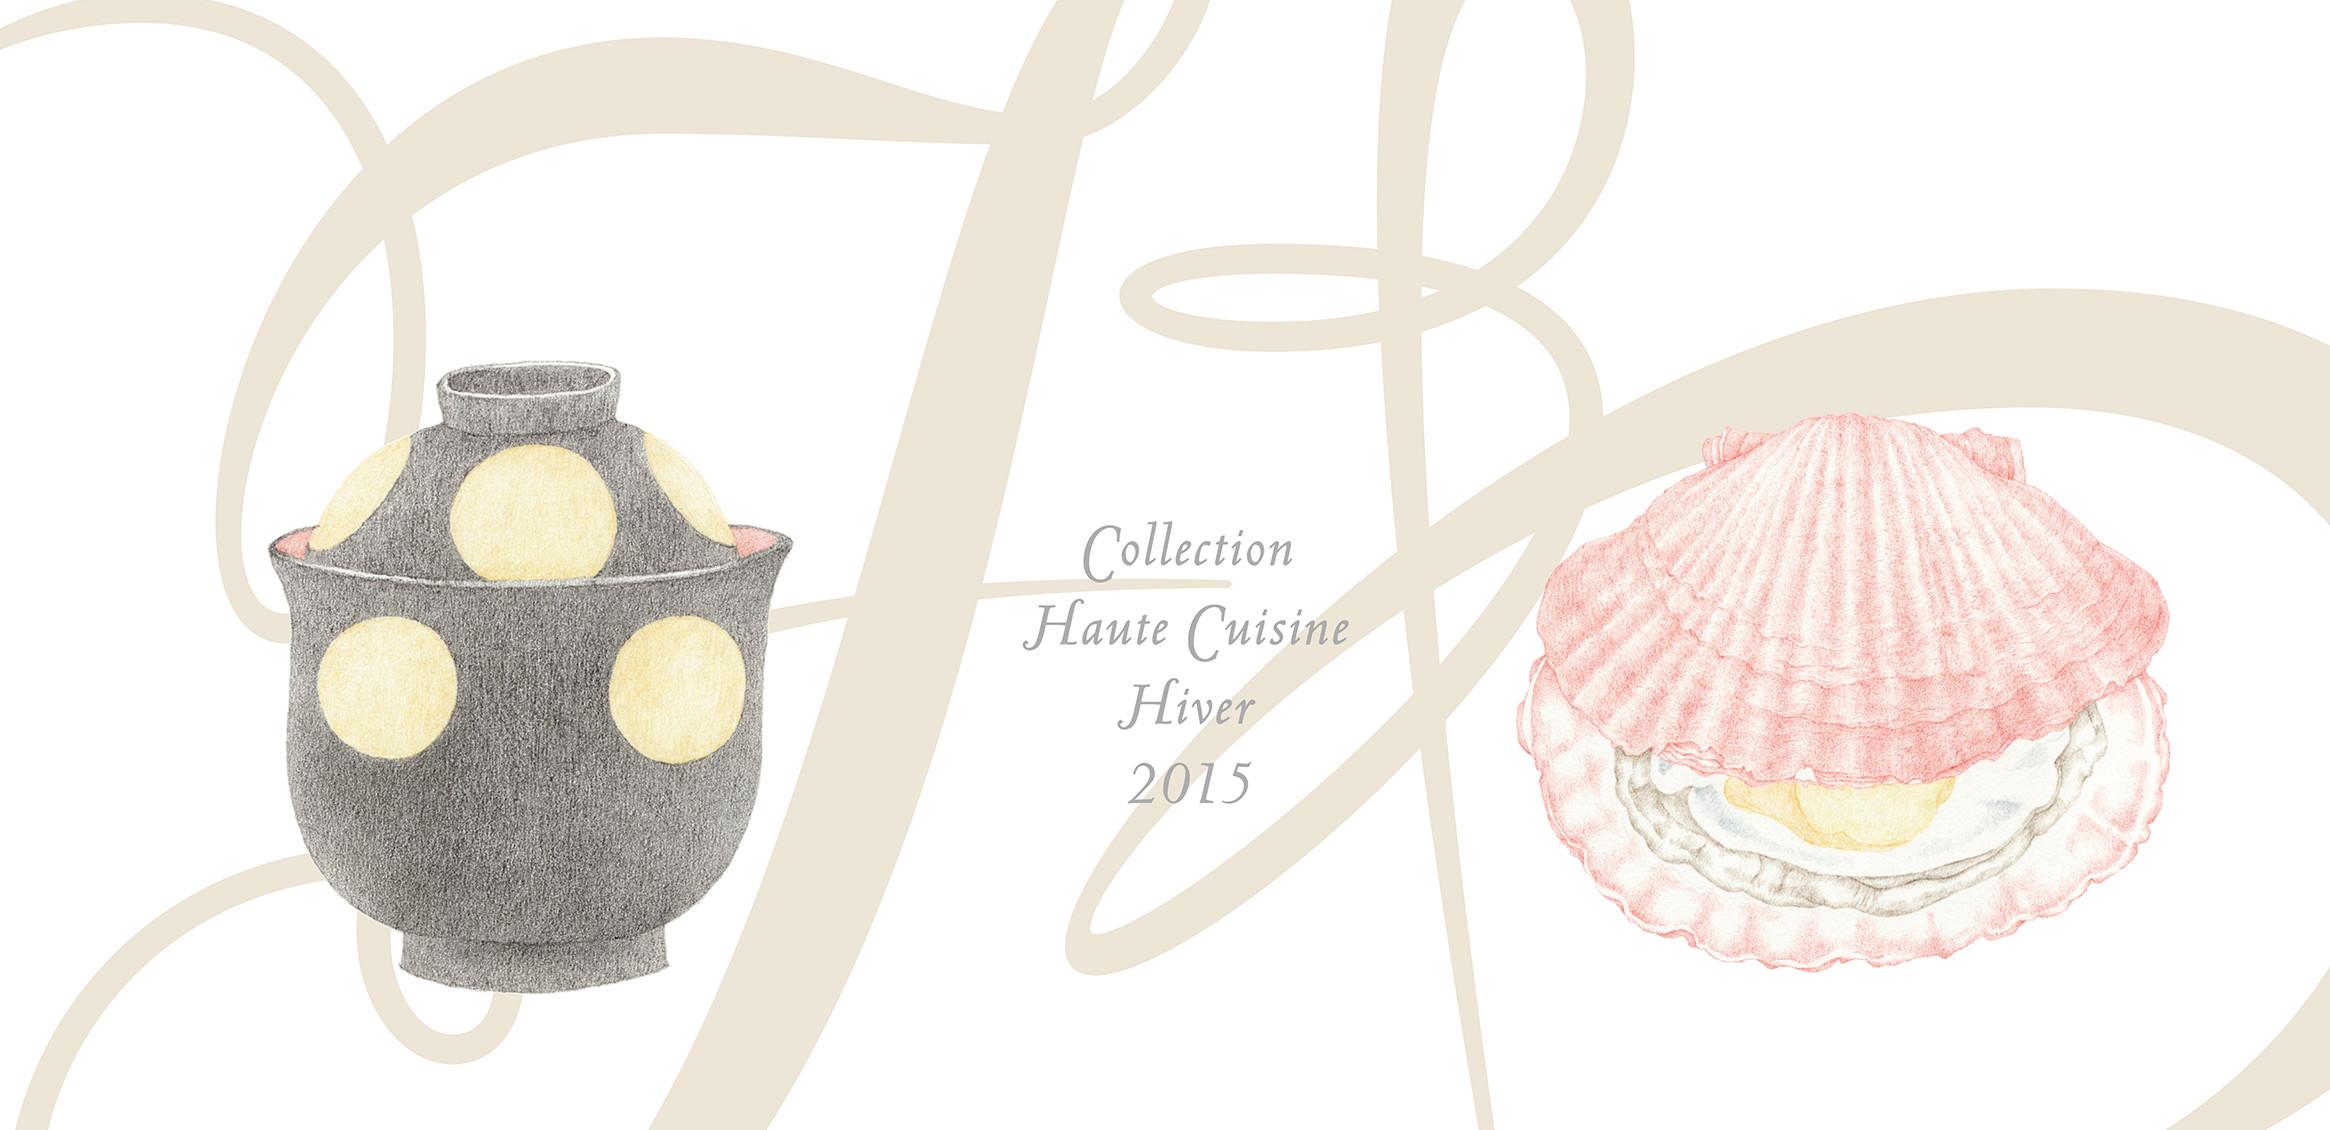 Collection Haute Cuisine Hiver 20151枚目